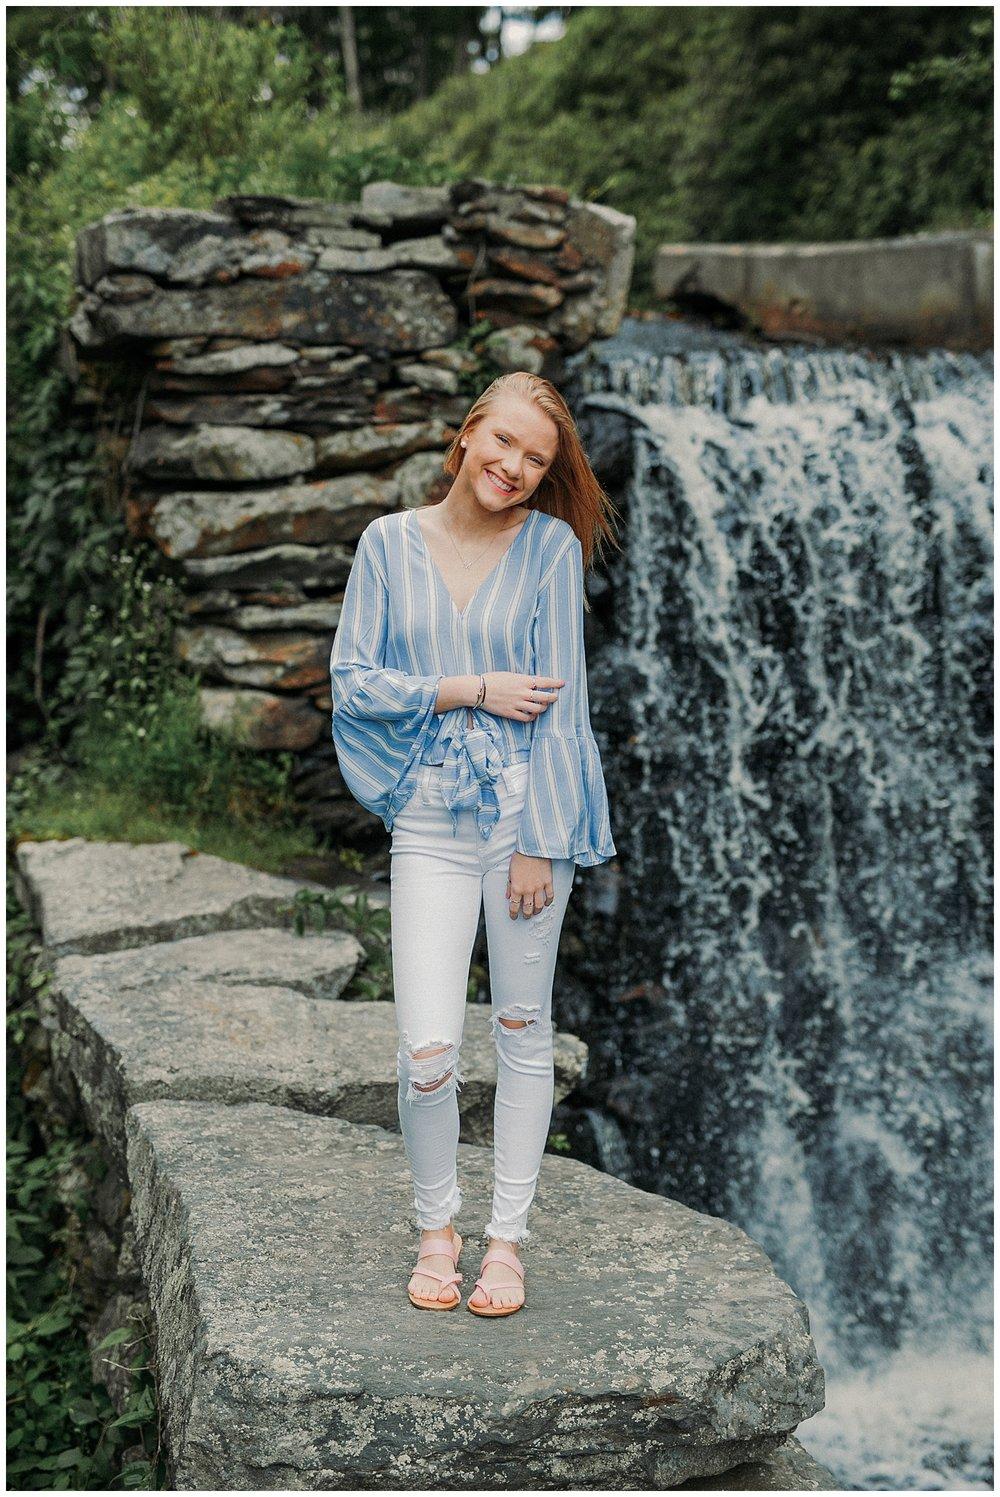 lindybeth photography - senior pictures - meghan-73.jpg